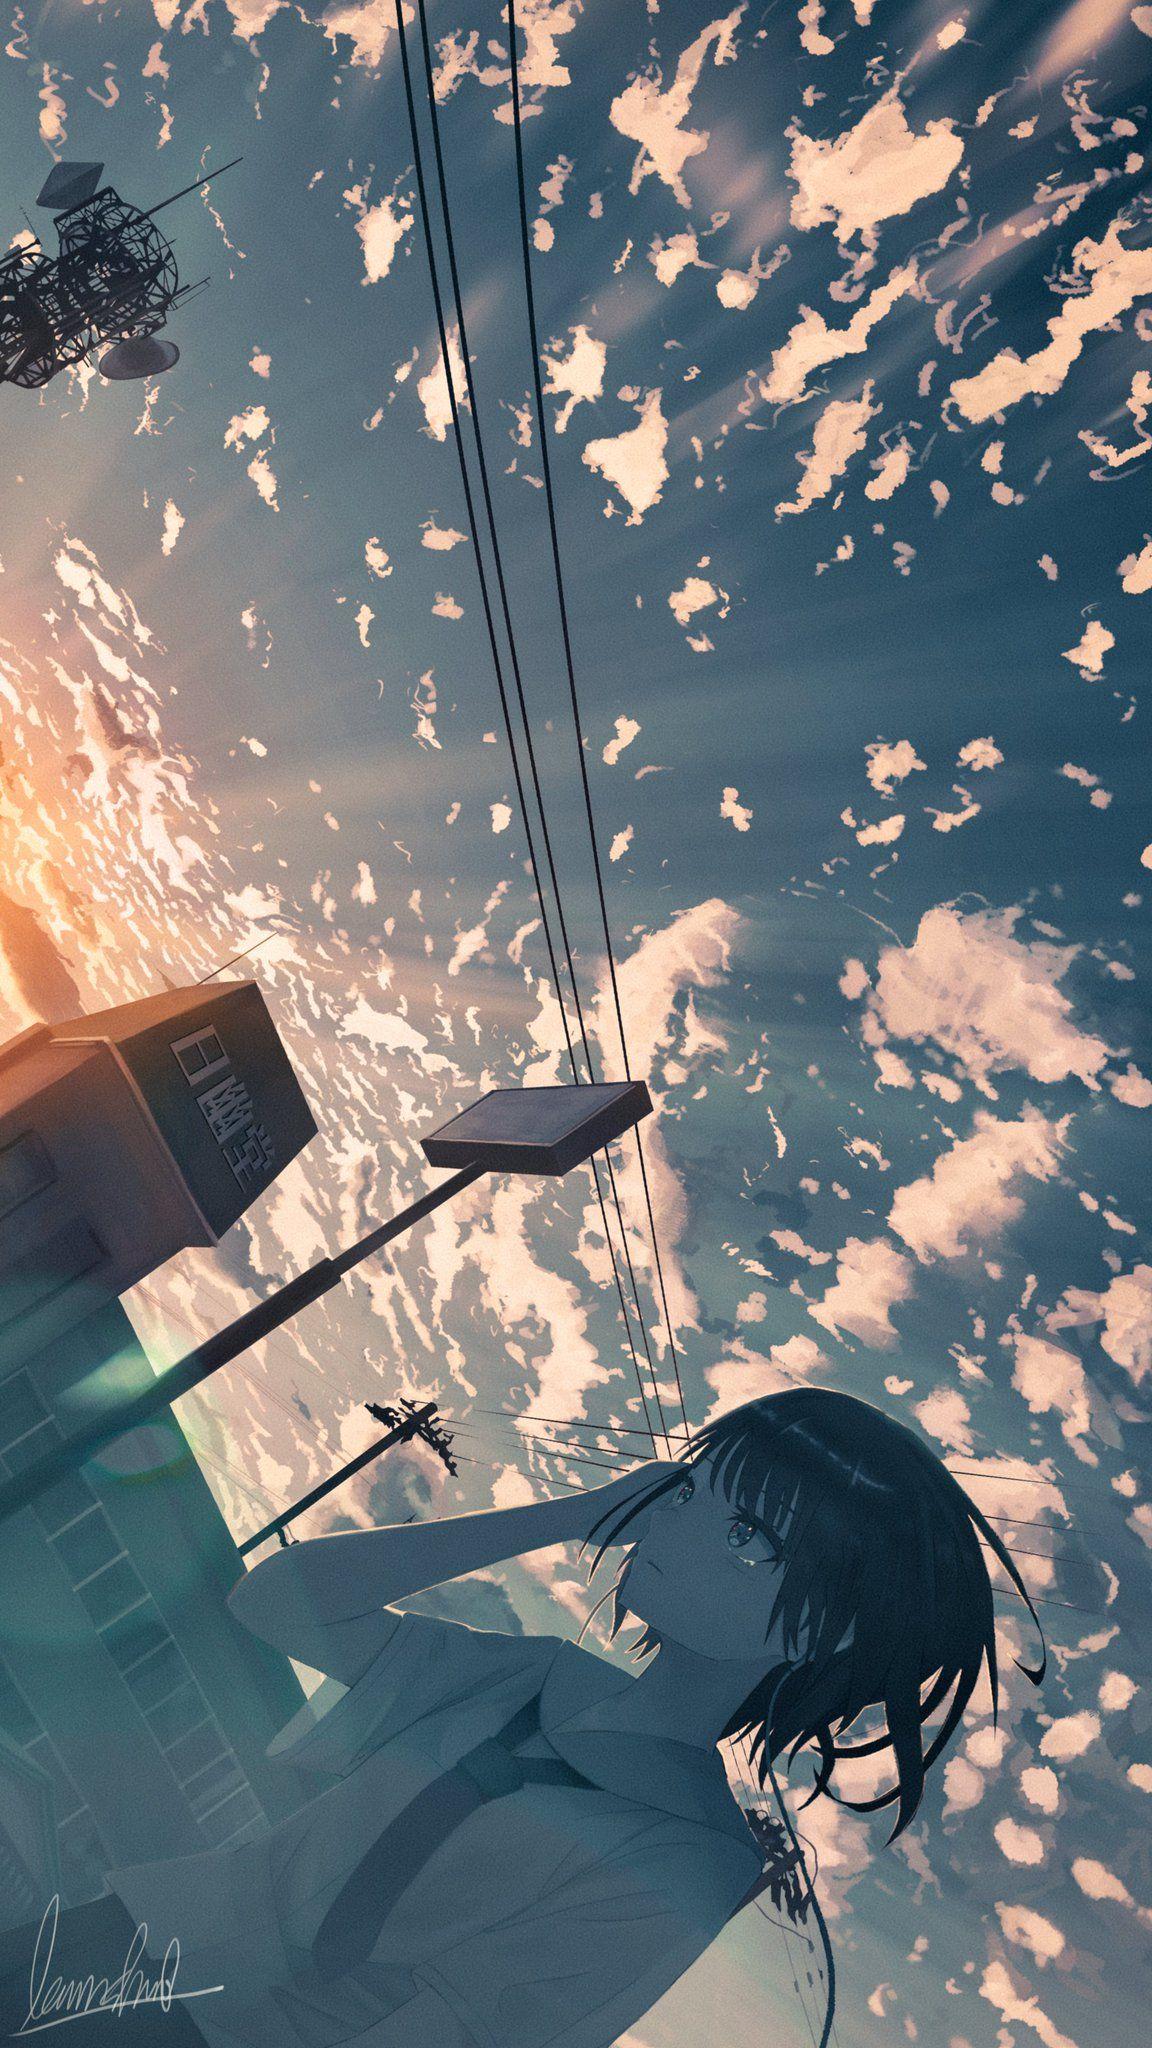 Twitter 幻想的なイラスト アニメの風景 風景の絵